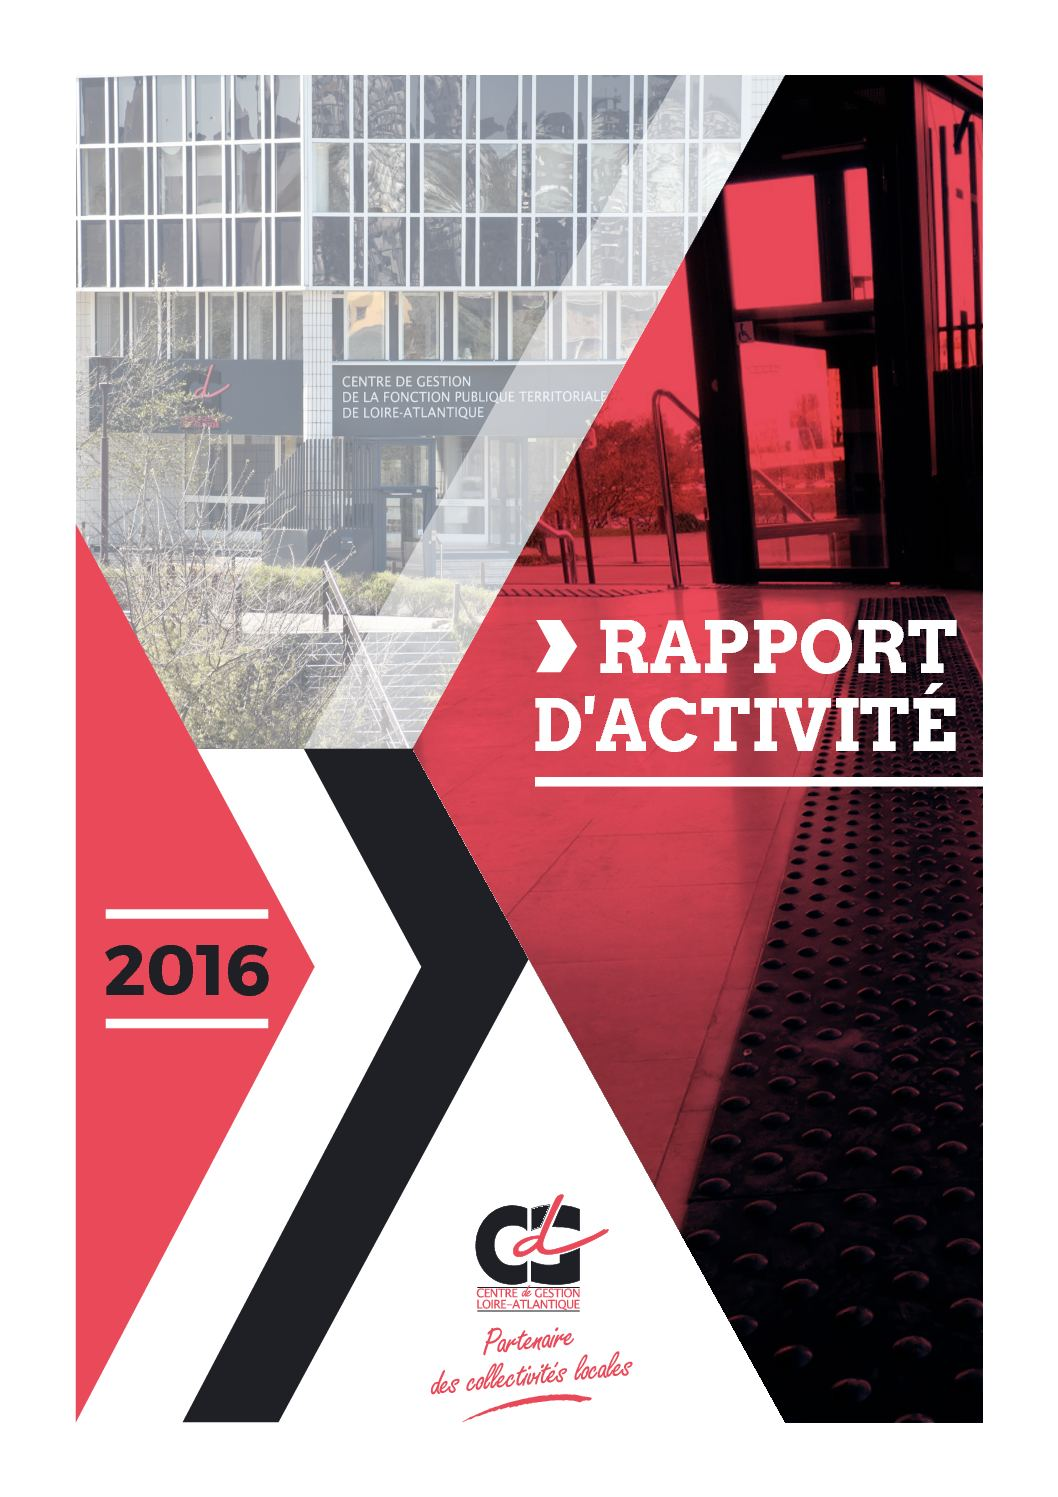 dee6f6bdade Calaméo - Rapport d activité du CDG44 de 2016